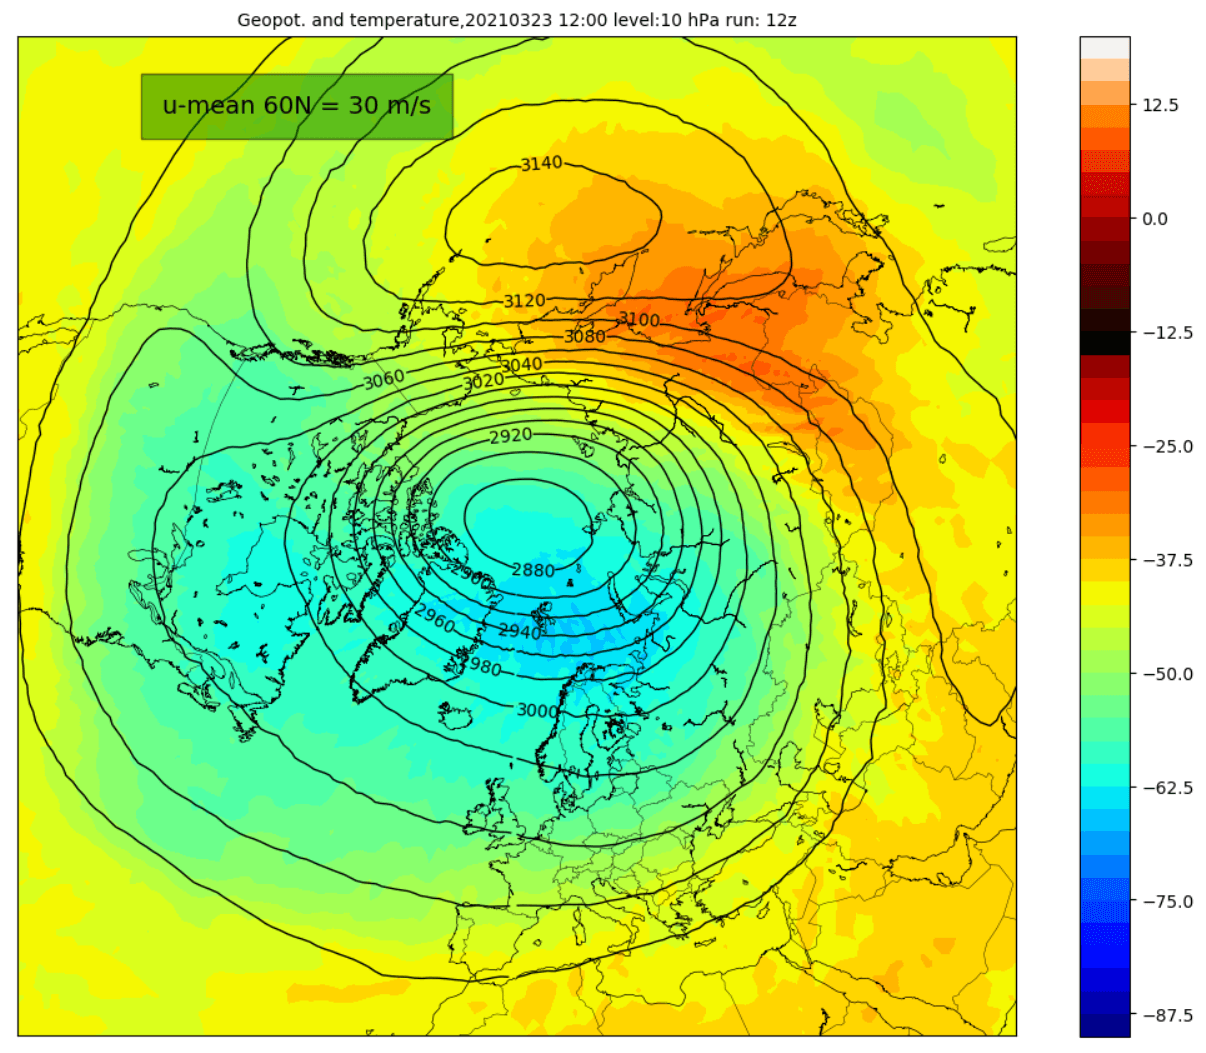 weather-forecast-march-april-2021-united-states-europe-polar-vortex-warming